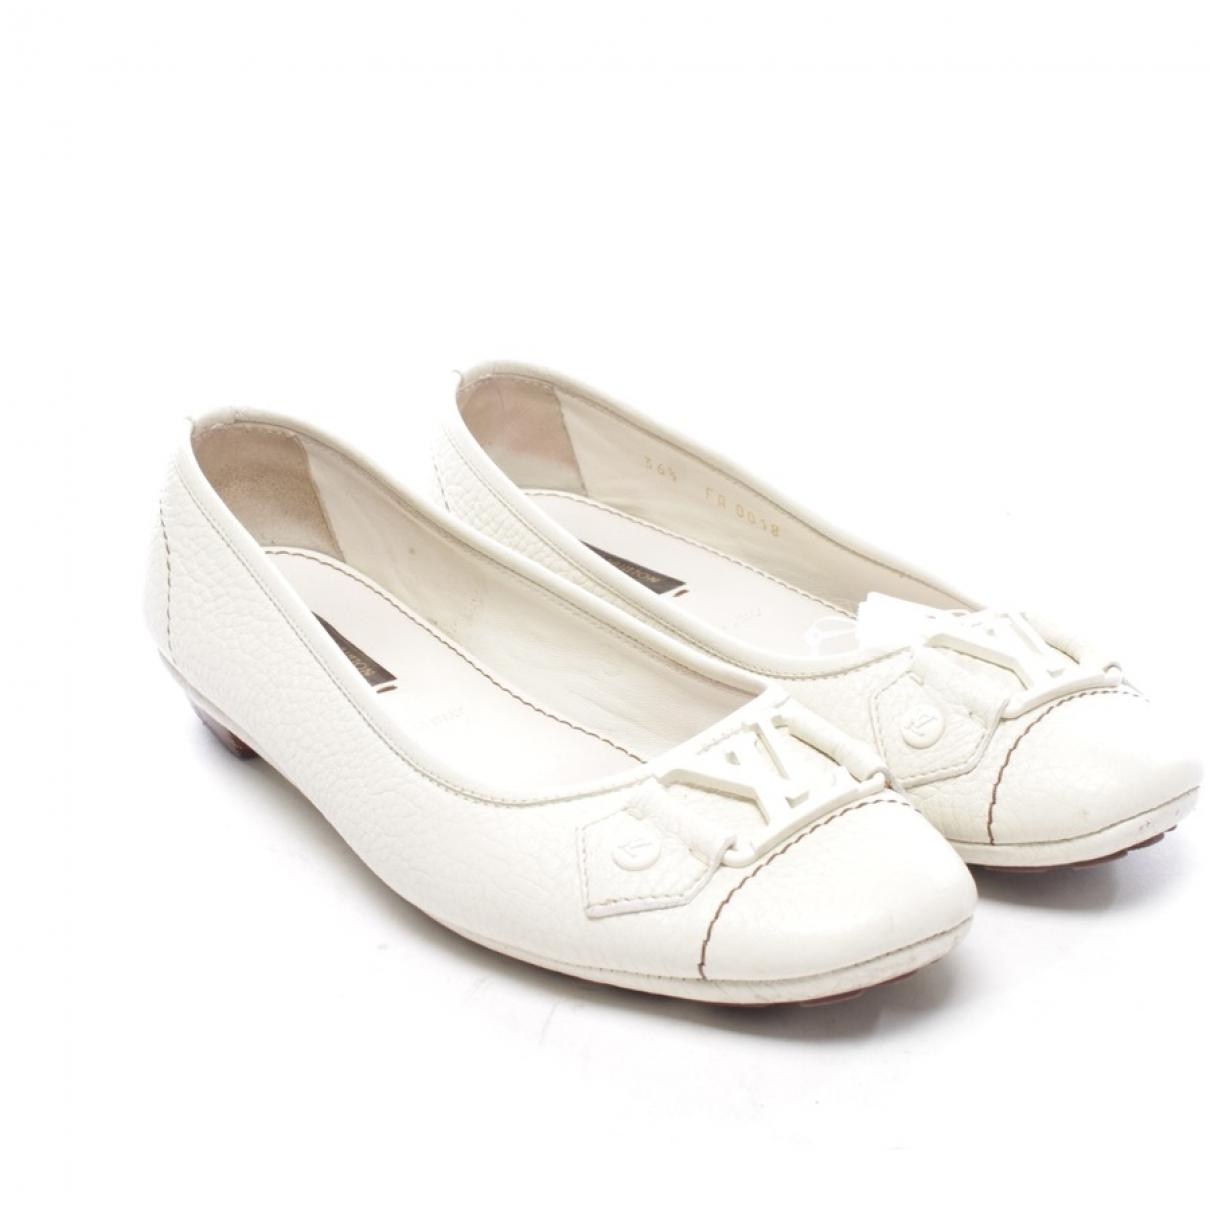 Bailarinas de Cuero Louis Vuitton